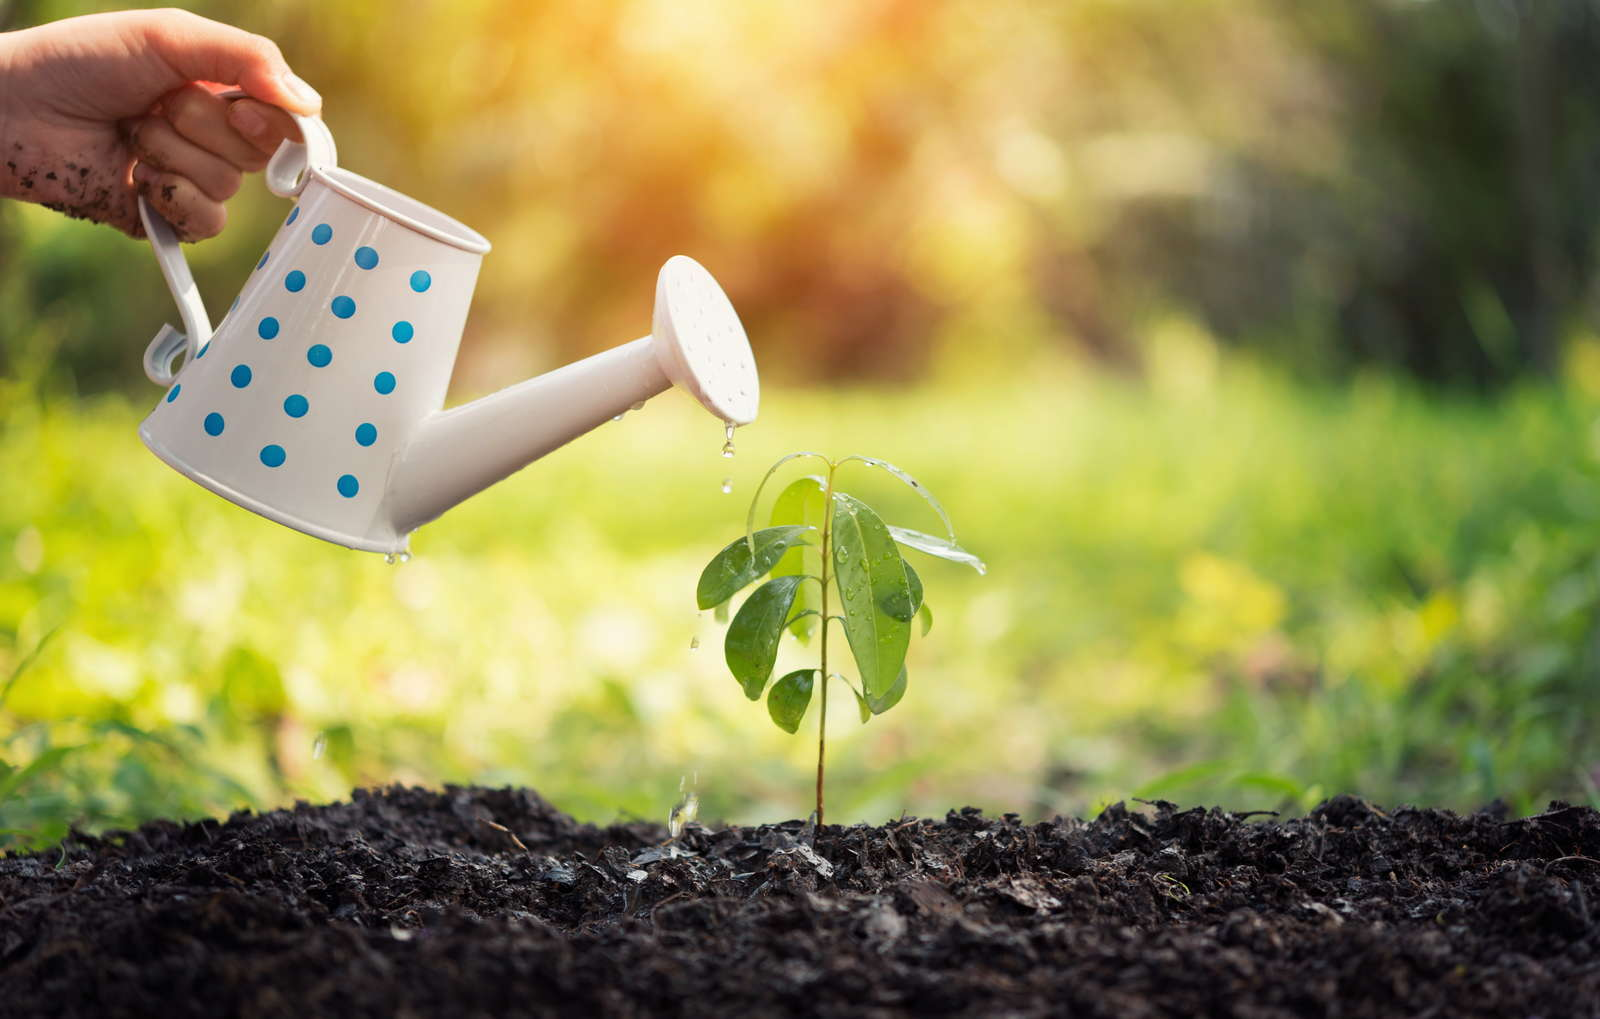 Lieblings Kirschlorbeer vermehren: Tipps & Anleitung vom Profi - Plantura @RN_66